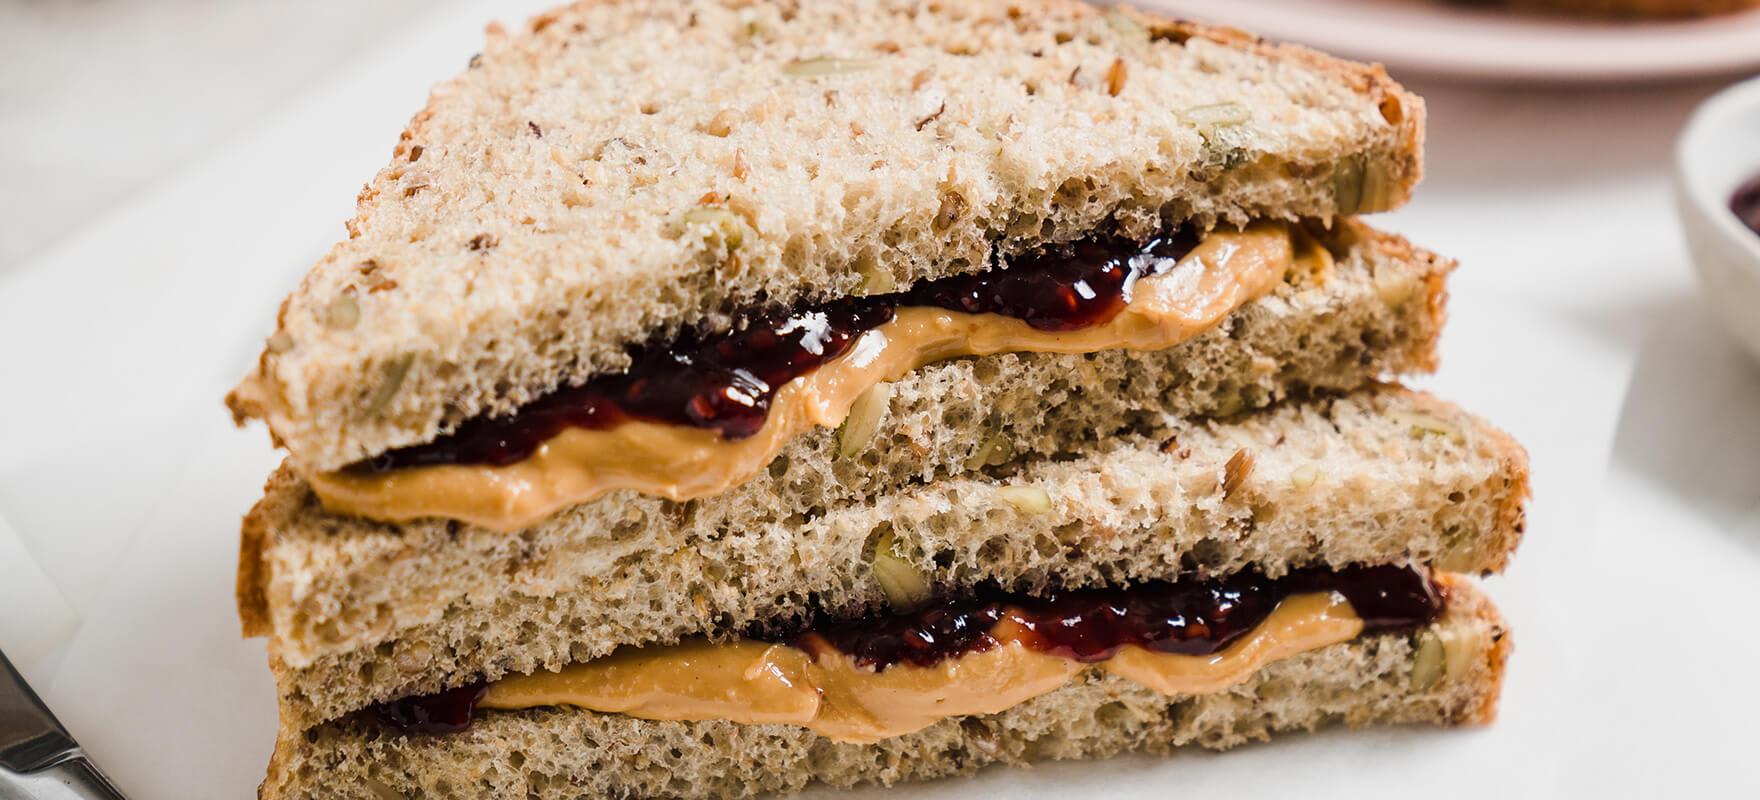 Peanut butter & jam sandwich image 2